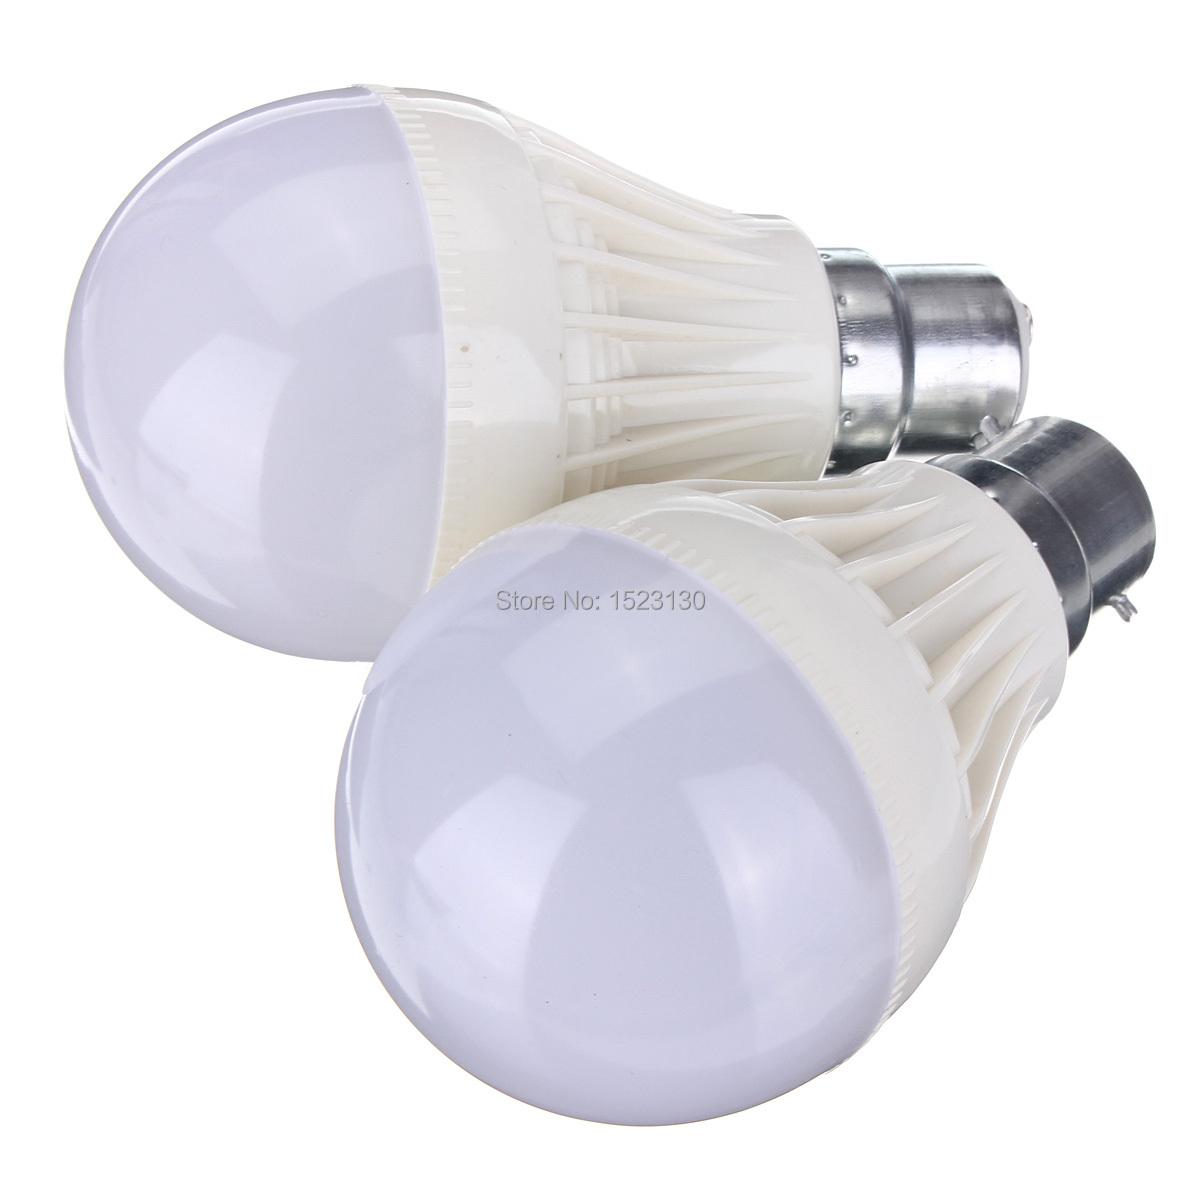 Brand New B22 5W 7W LED 2835 SMD Sound Voice Auto Sensor LED Light Bulb Home Hallway Corridor Lamp AC220-240V(China (Mainland))